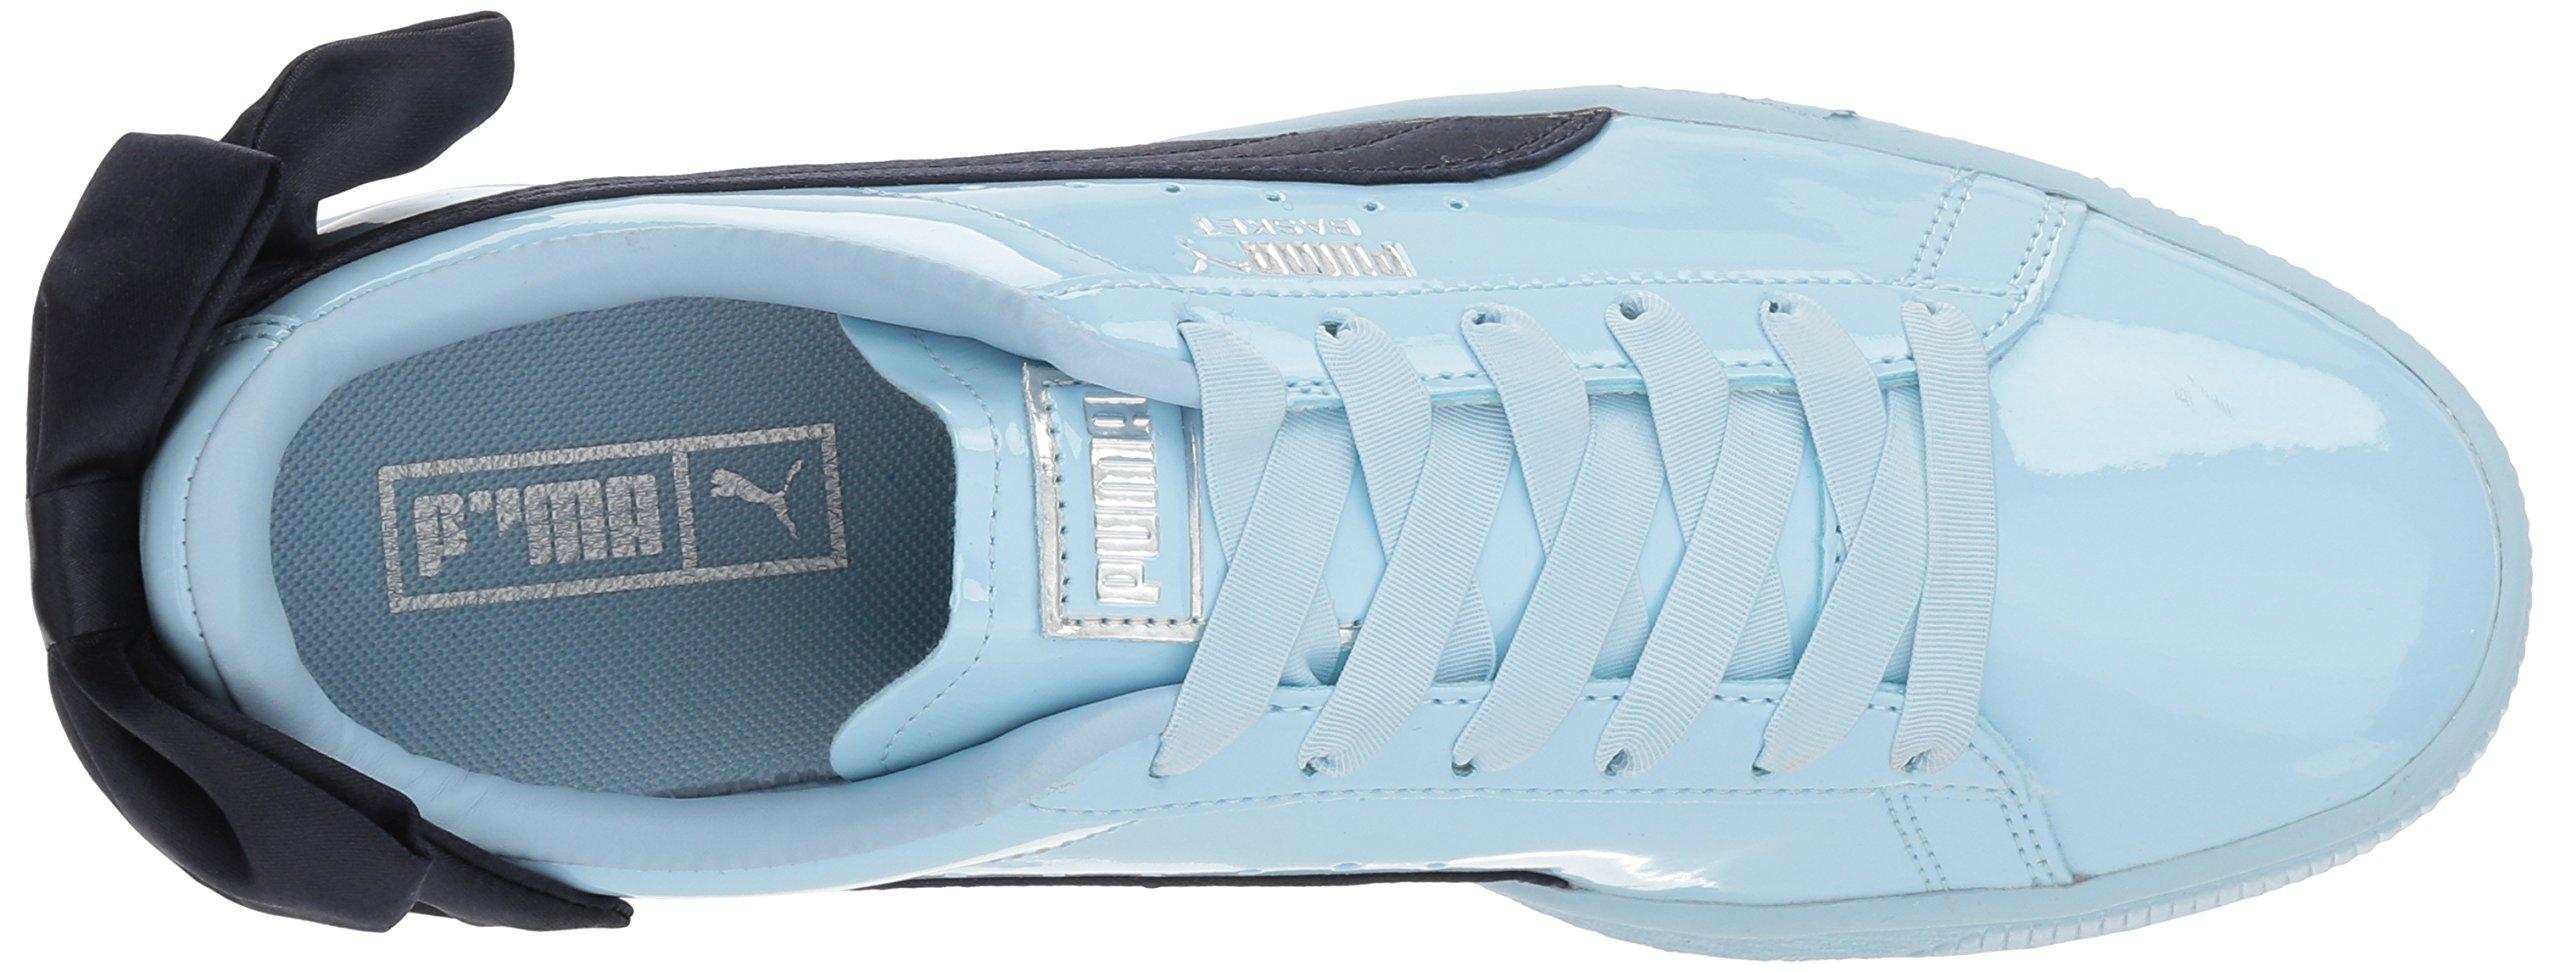 PUMA Unisex-Kids Basket Bow Patent Sneaker, Cerulean-Peacoat, 12 M US Little Kid by PUMA (Image #8)